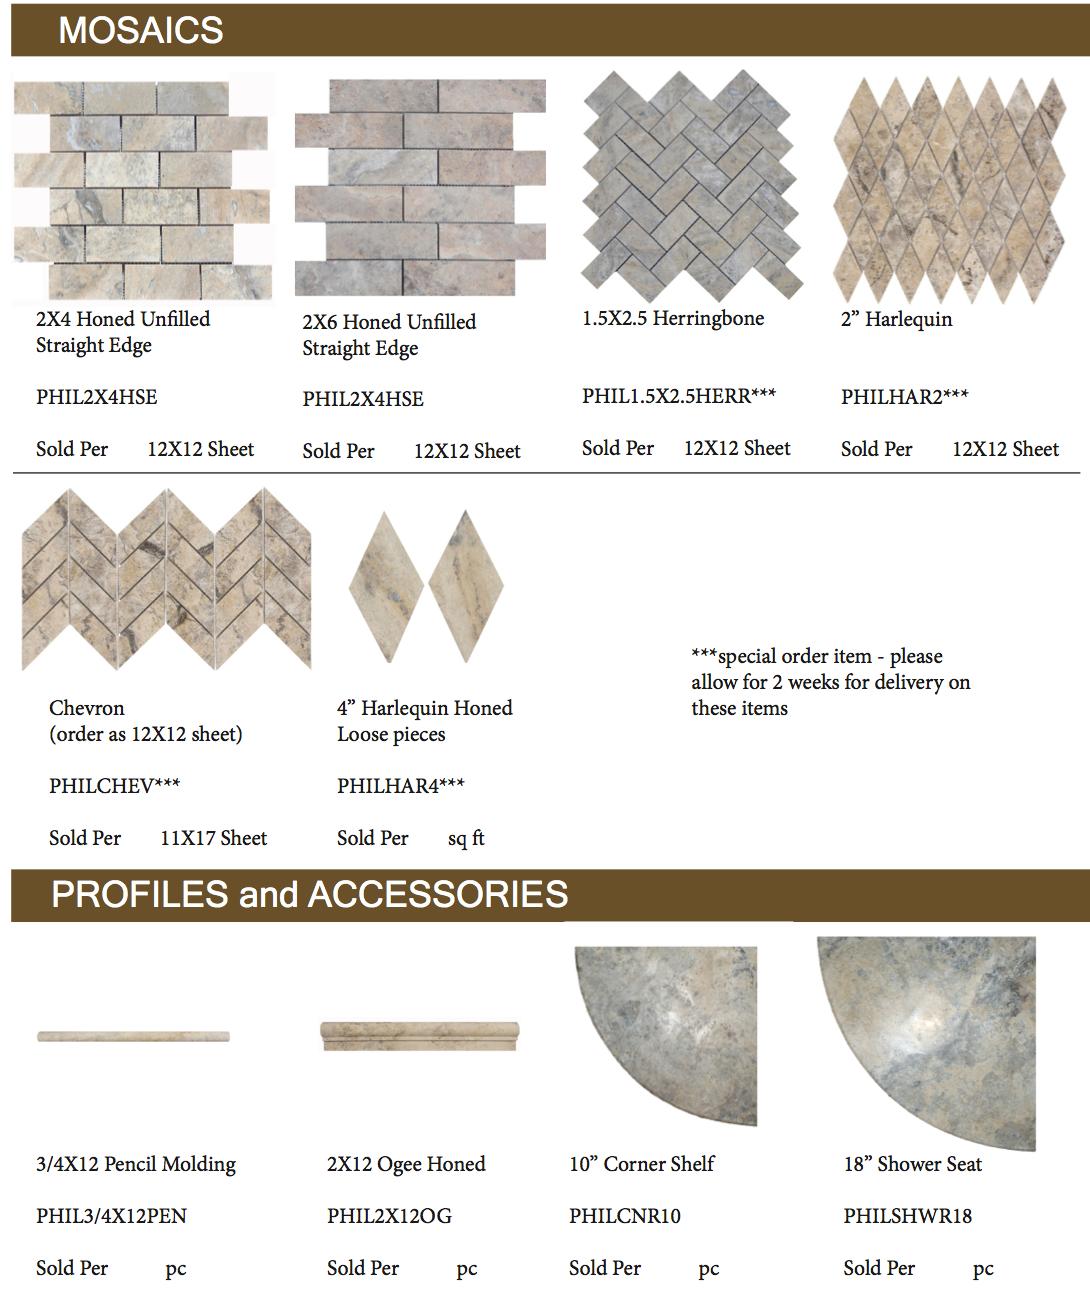 Philadelphia-Travertine-Mosaics-Profiles-and-Accessories